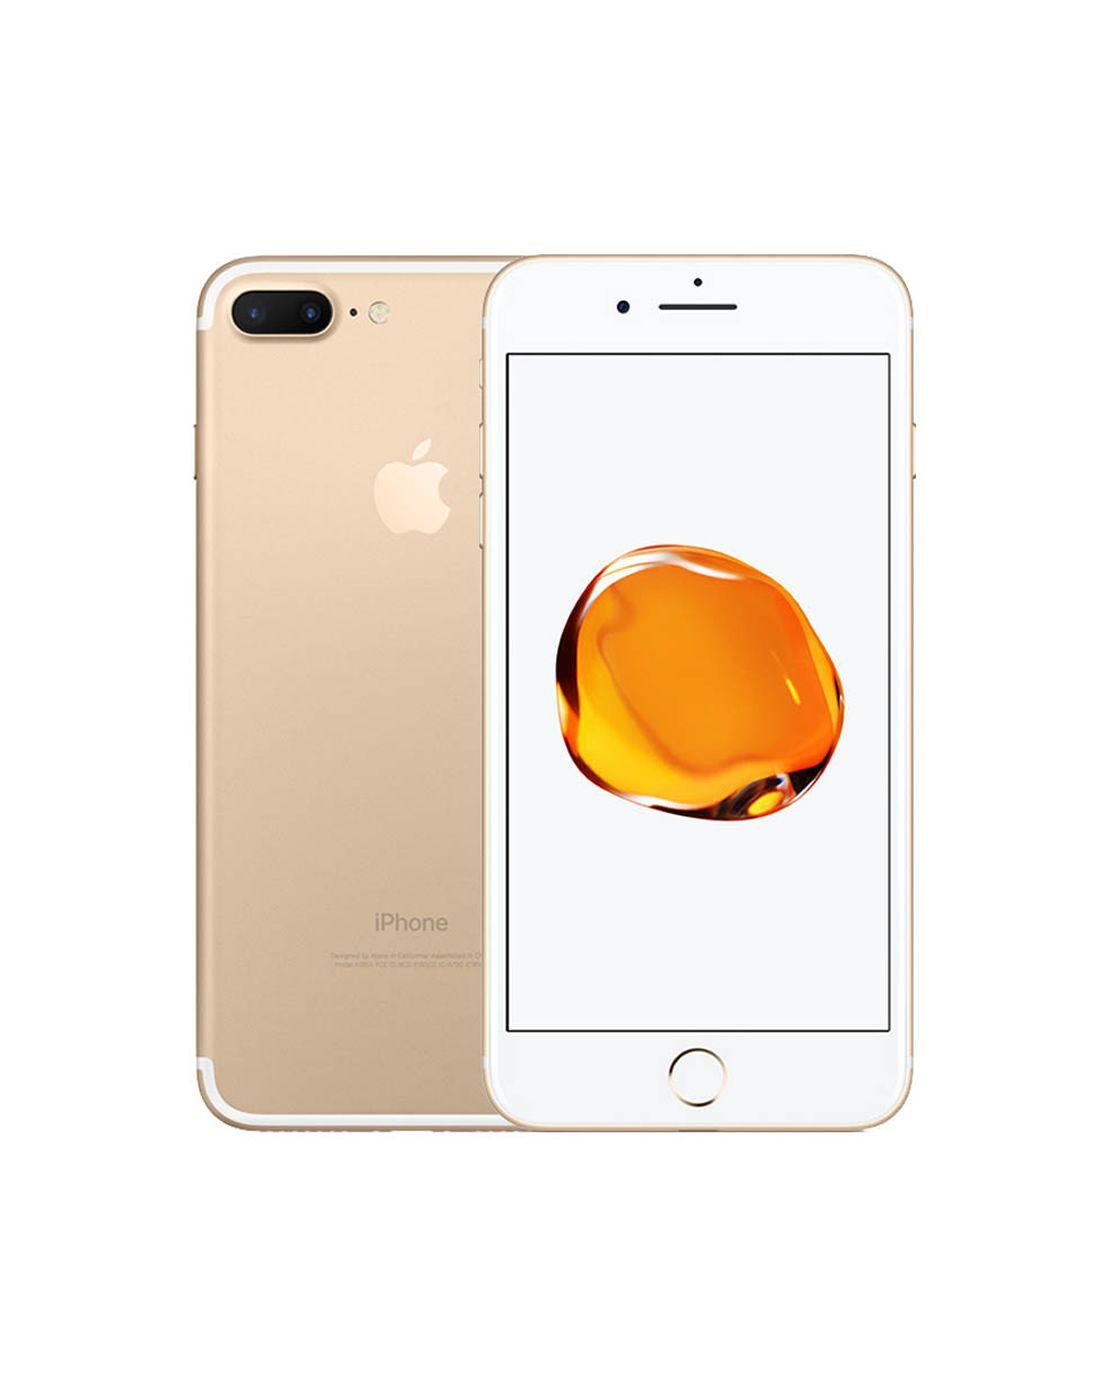 �9�+��ky����a_苹果iphone7 plus 32g金 全网通5mnrl2套餐a_唯品会